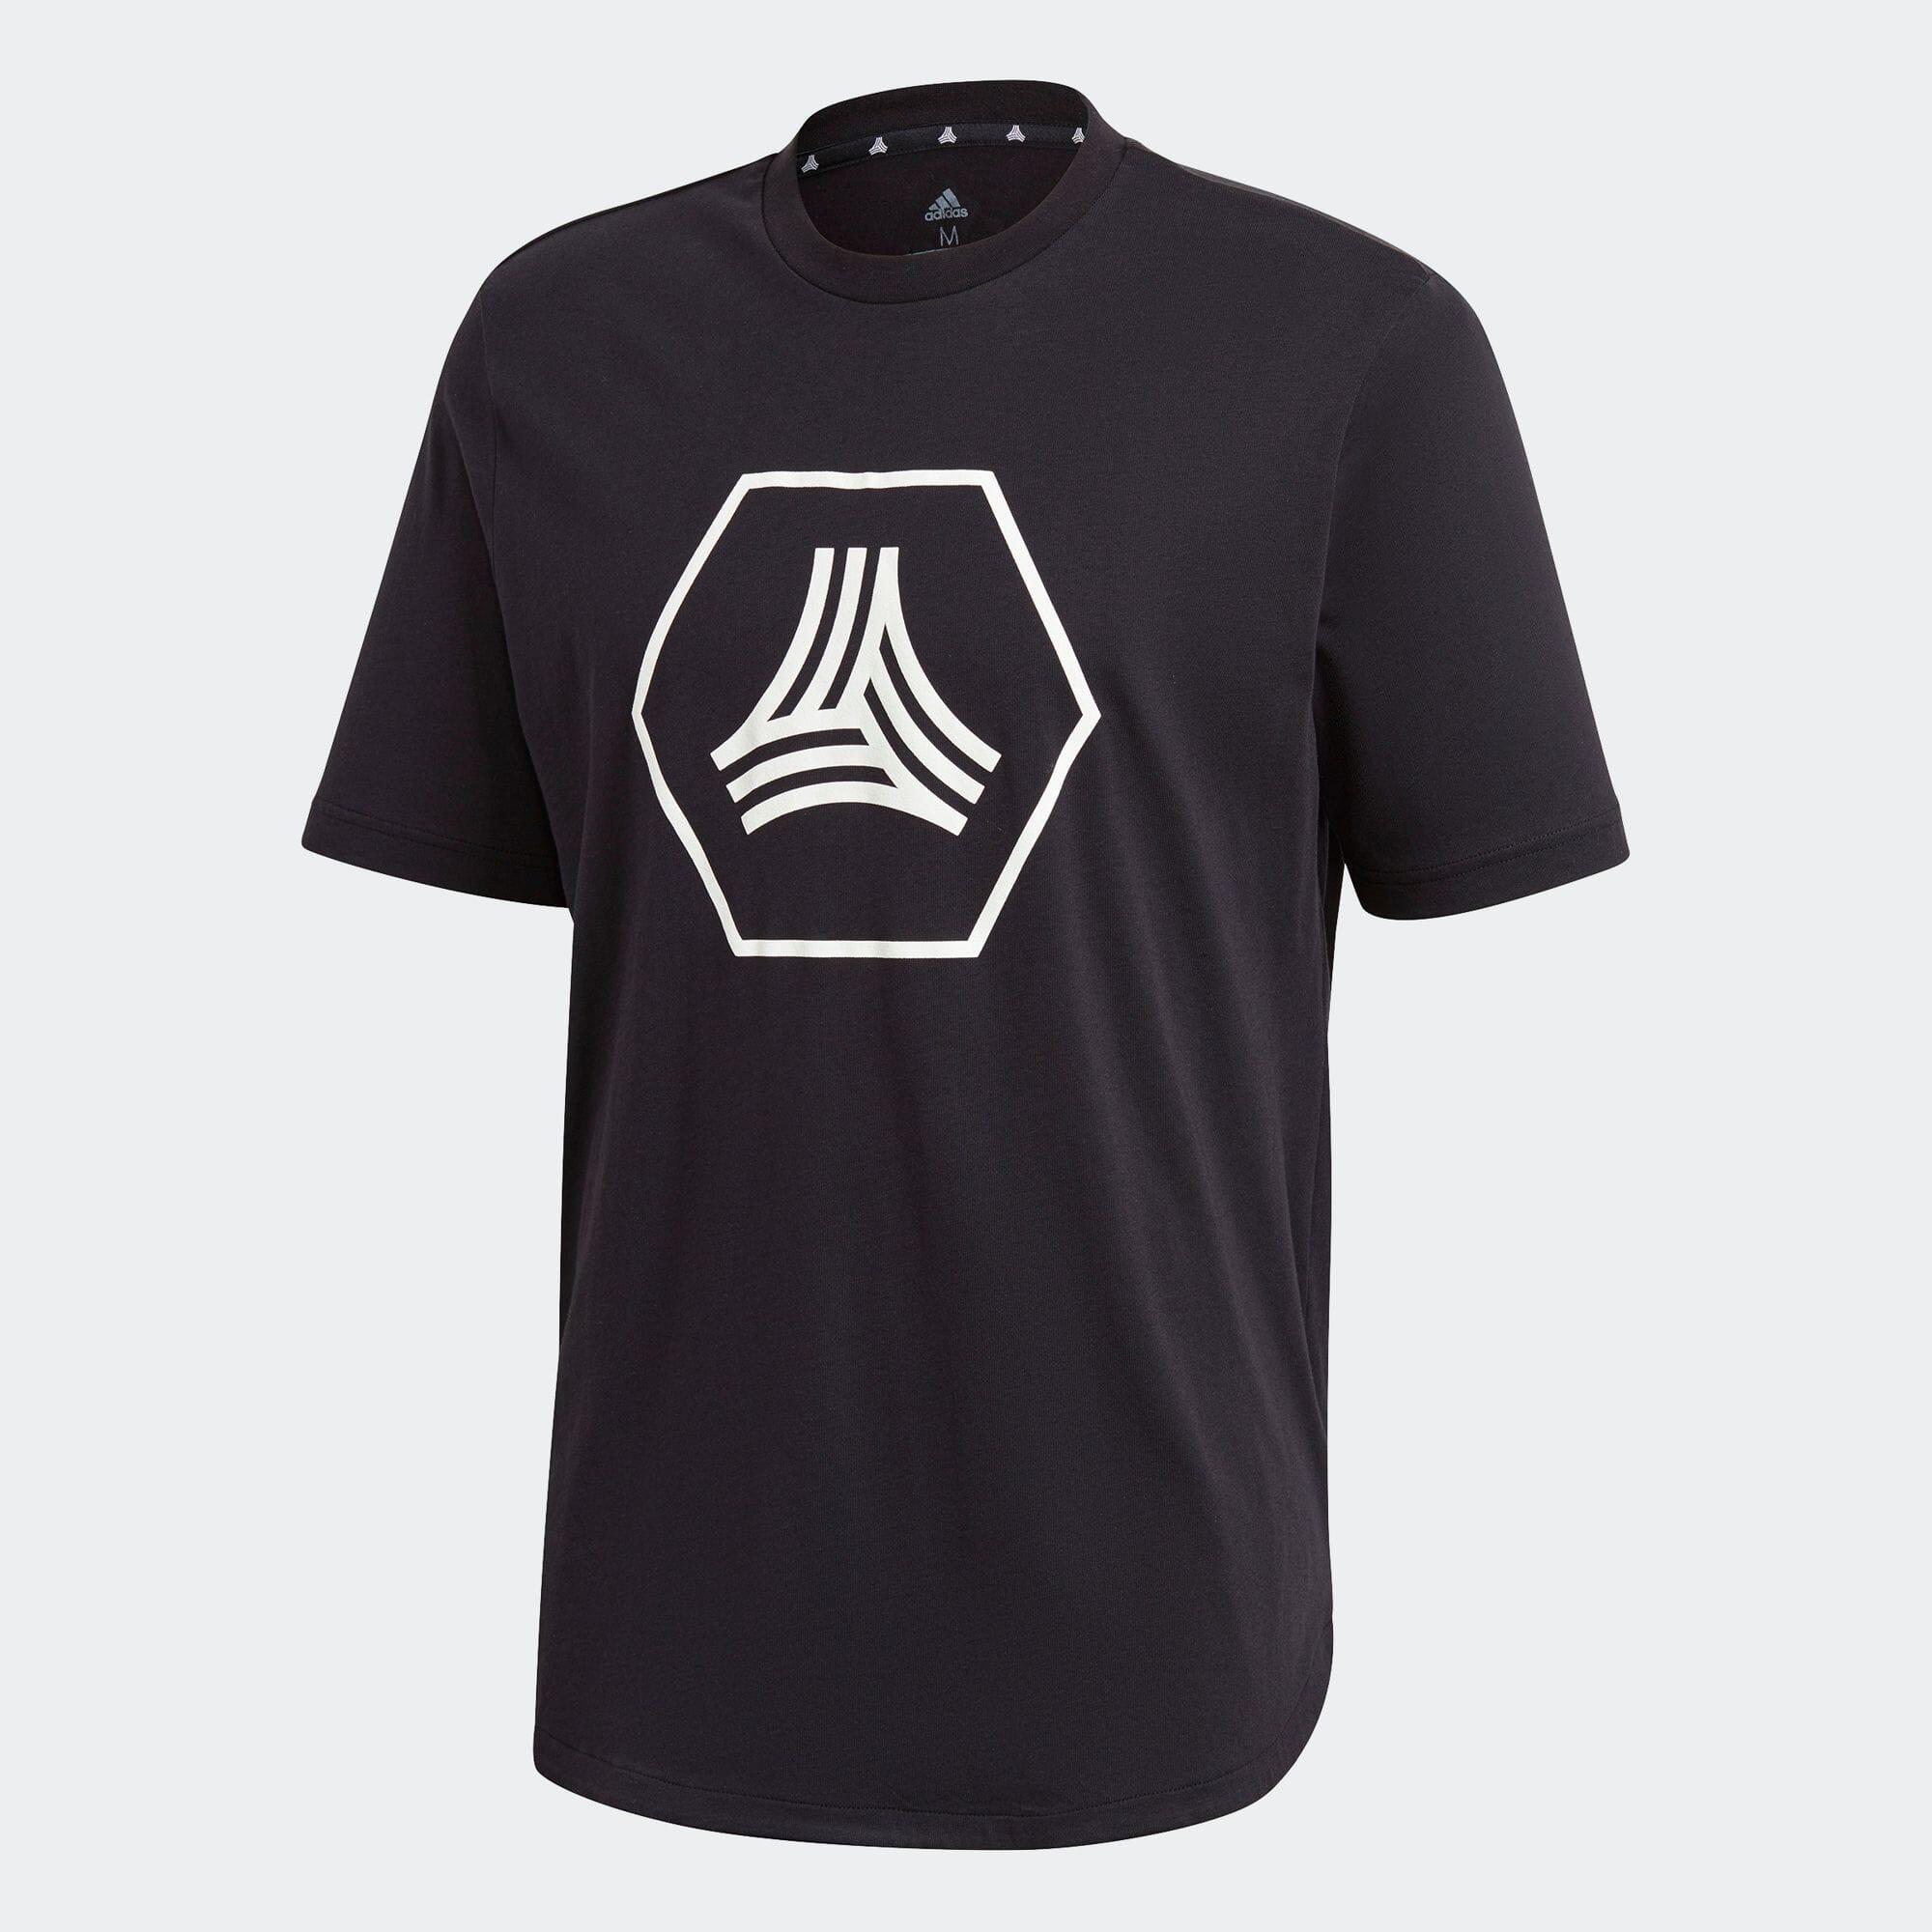 TAN ビッグロゴTシャツ / TAN Big Logo Tee